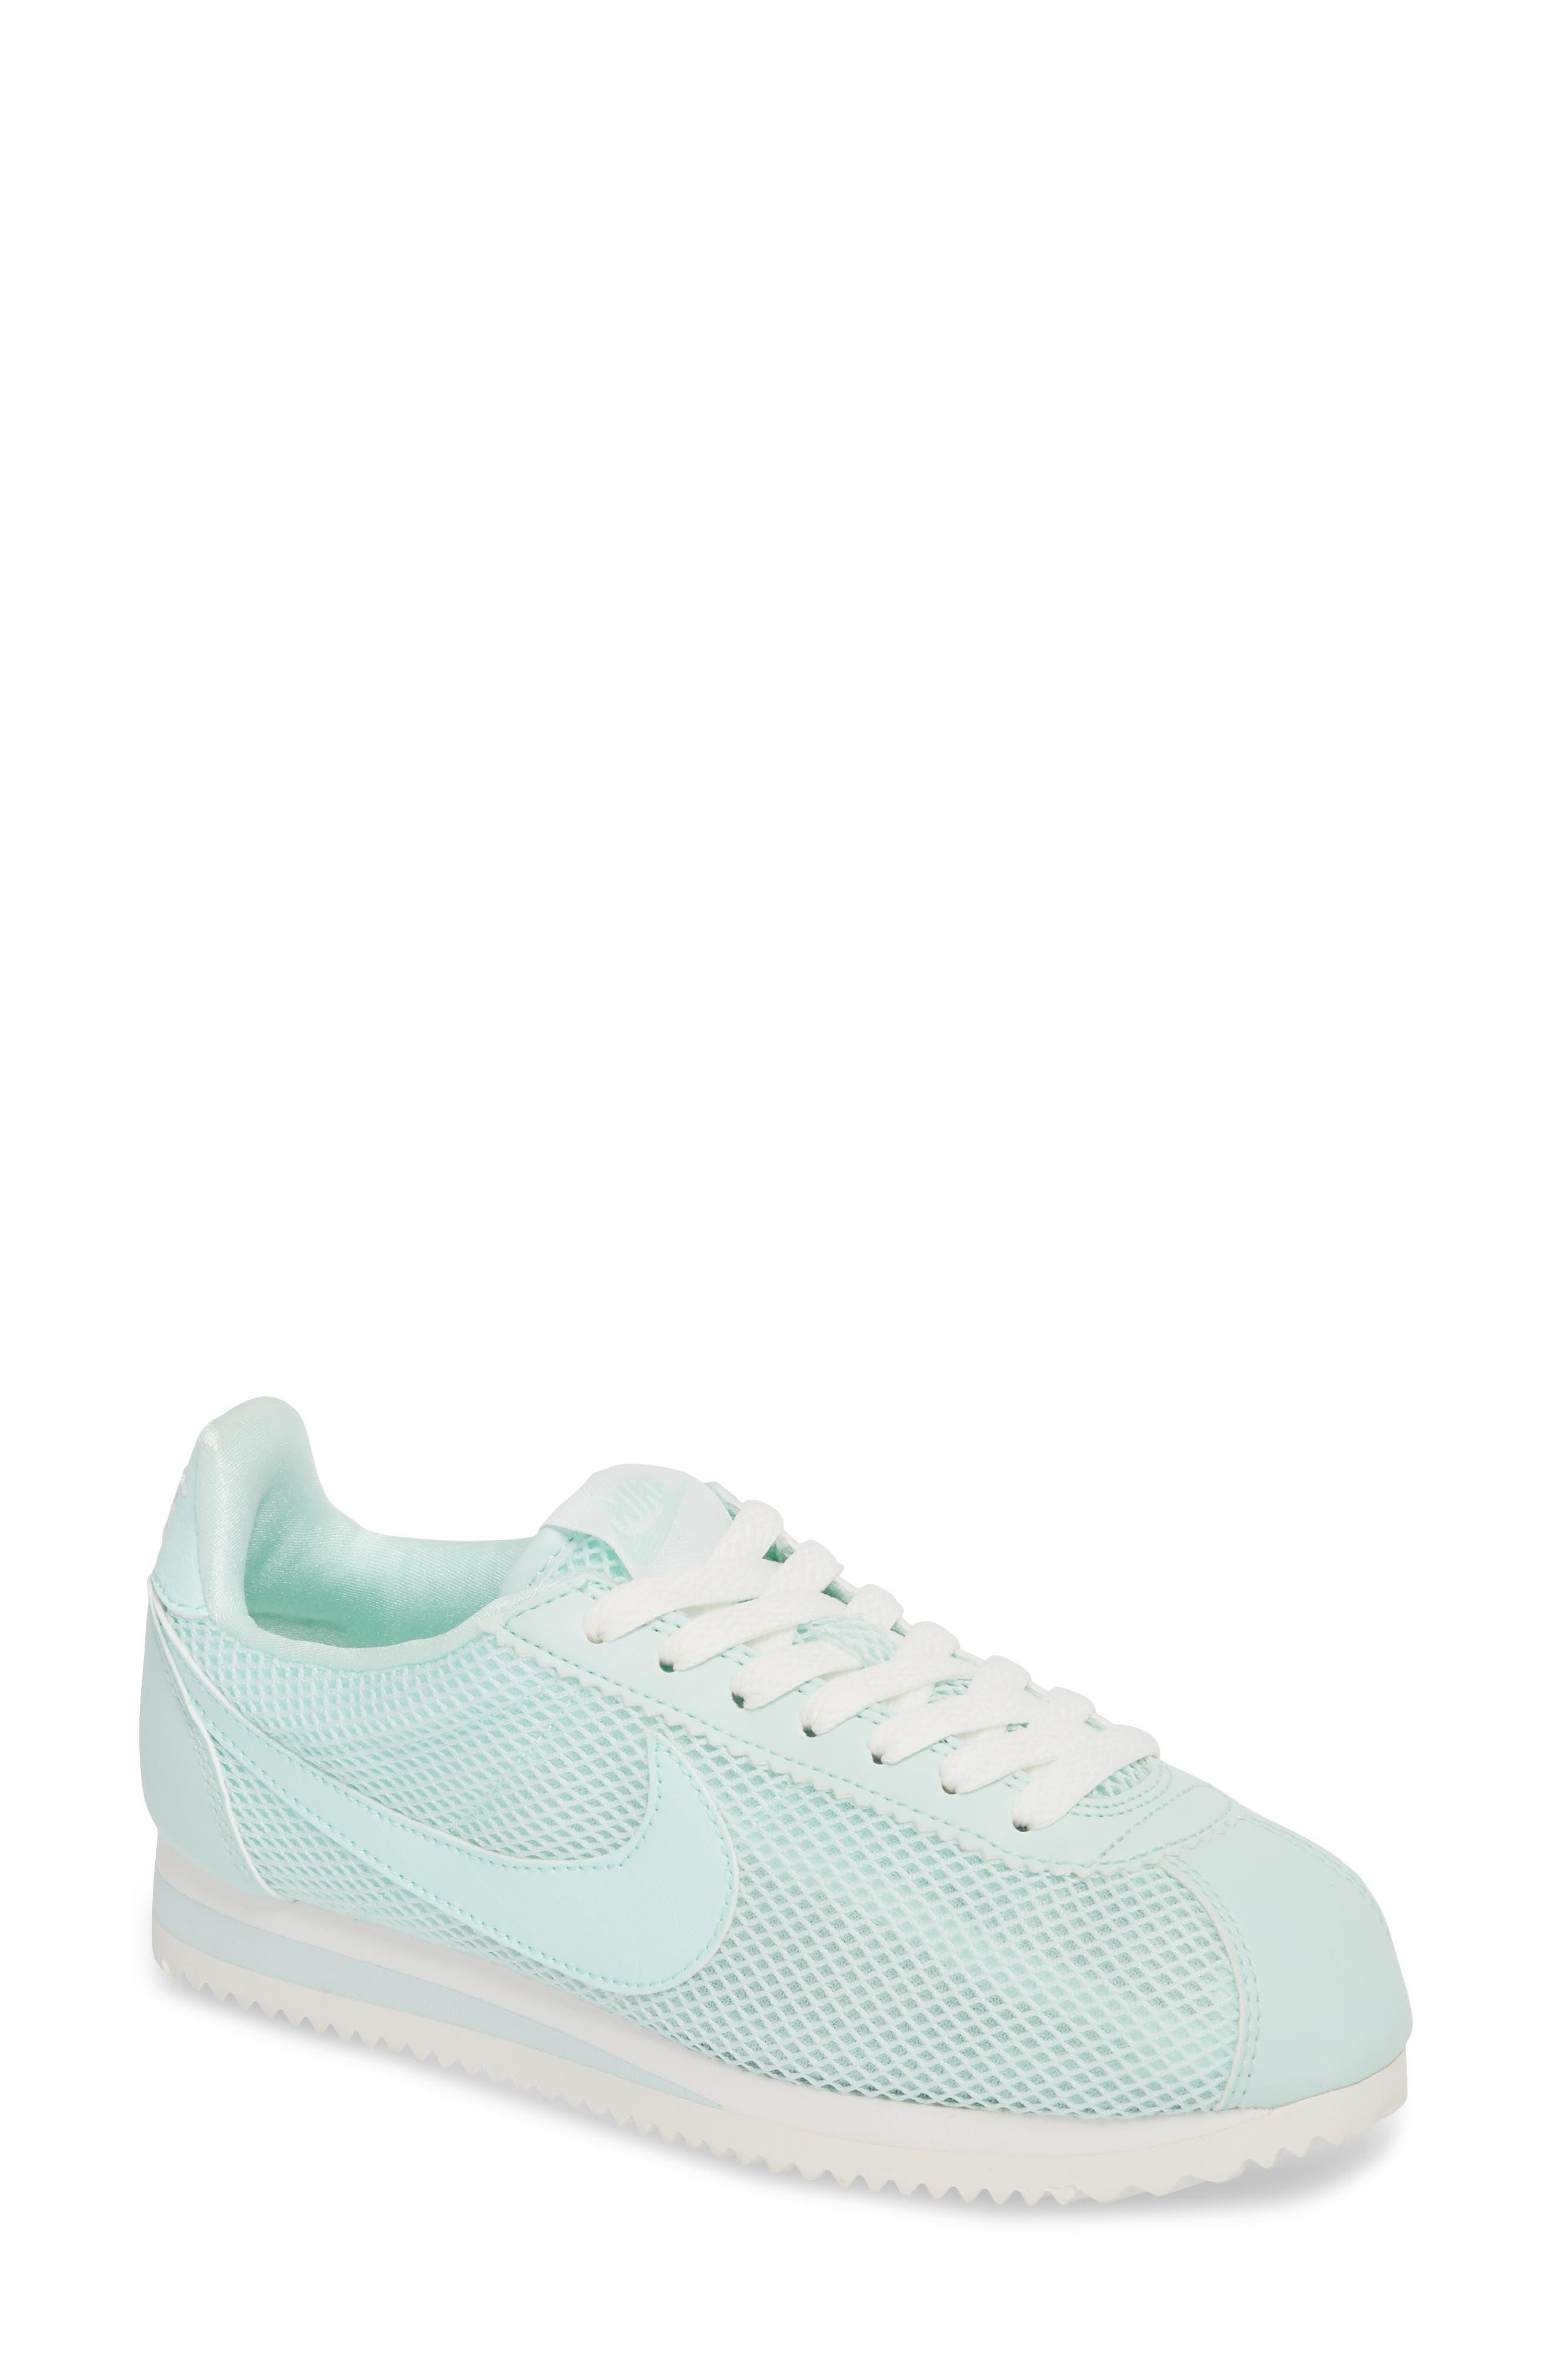 Classic Cortez Premium XLV Sneaker,                             Main thumbnail 1, color,                             Igloo/ Igloo/ Summit White